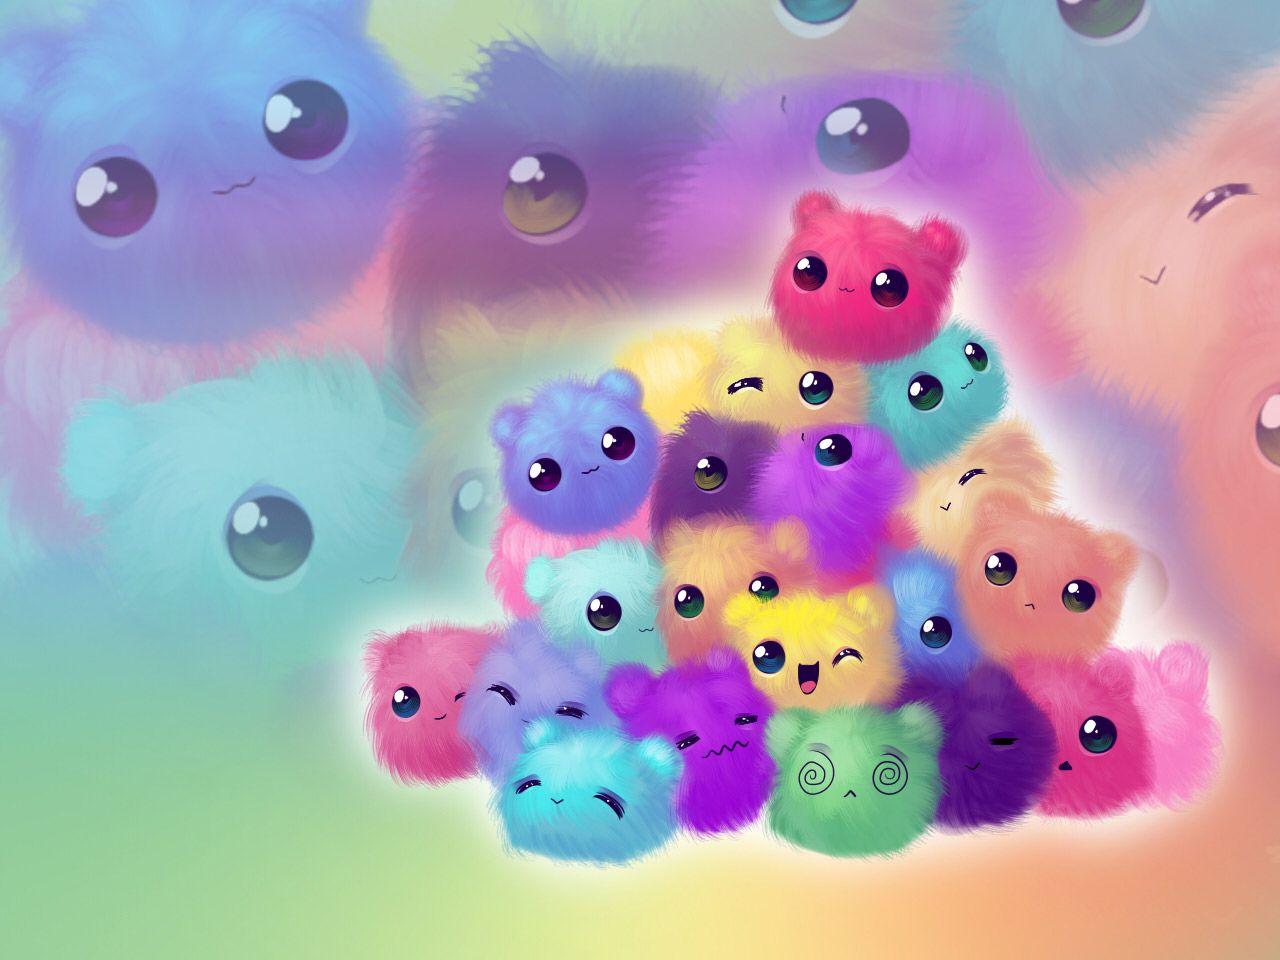 Cutest Things Ever Cute Wallpapers Kawaii Wallpaper Cute Backgrounds